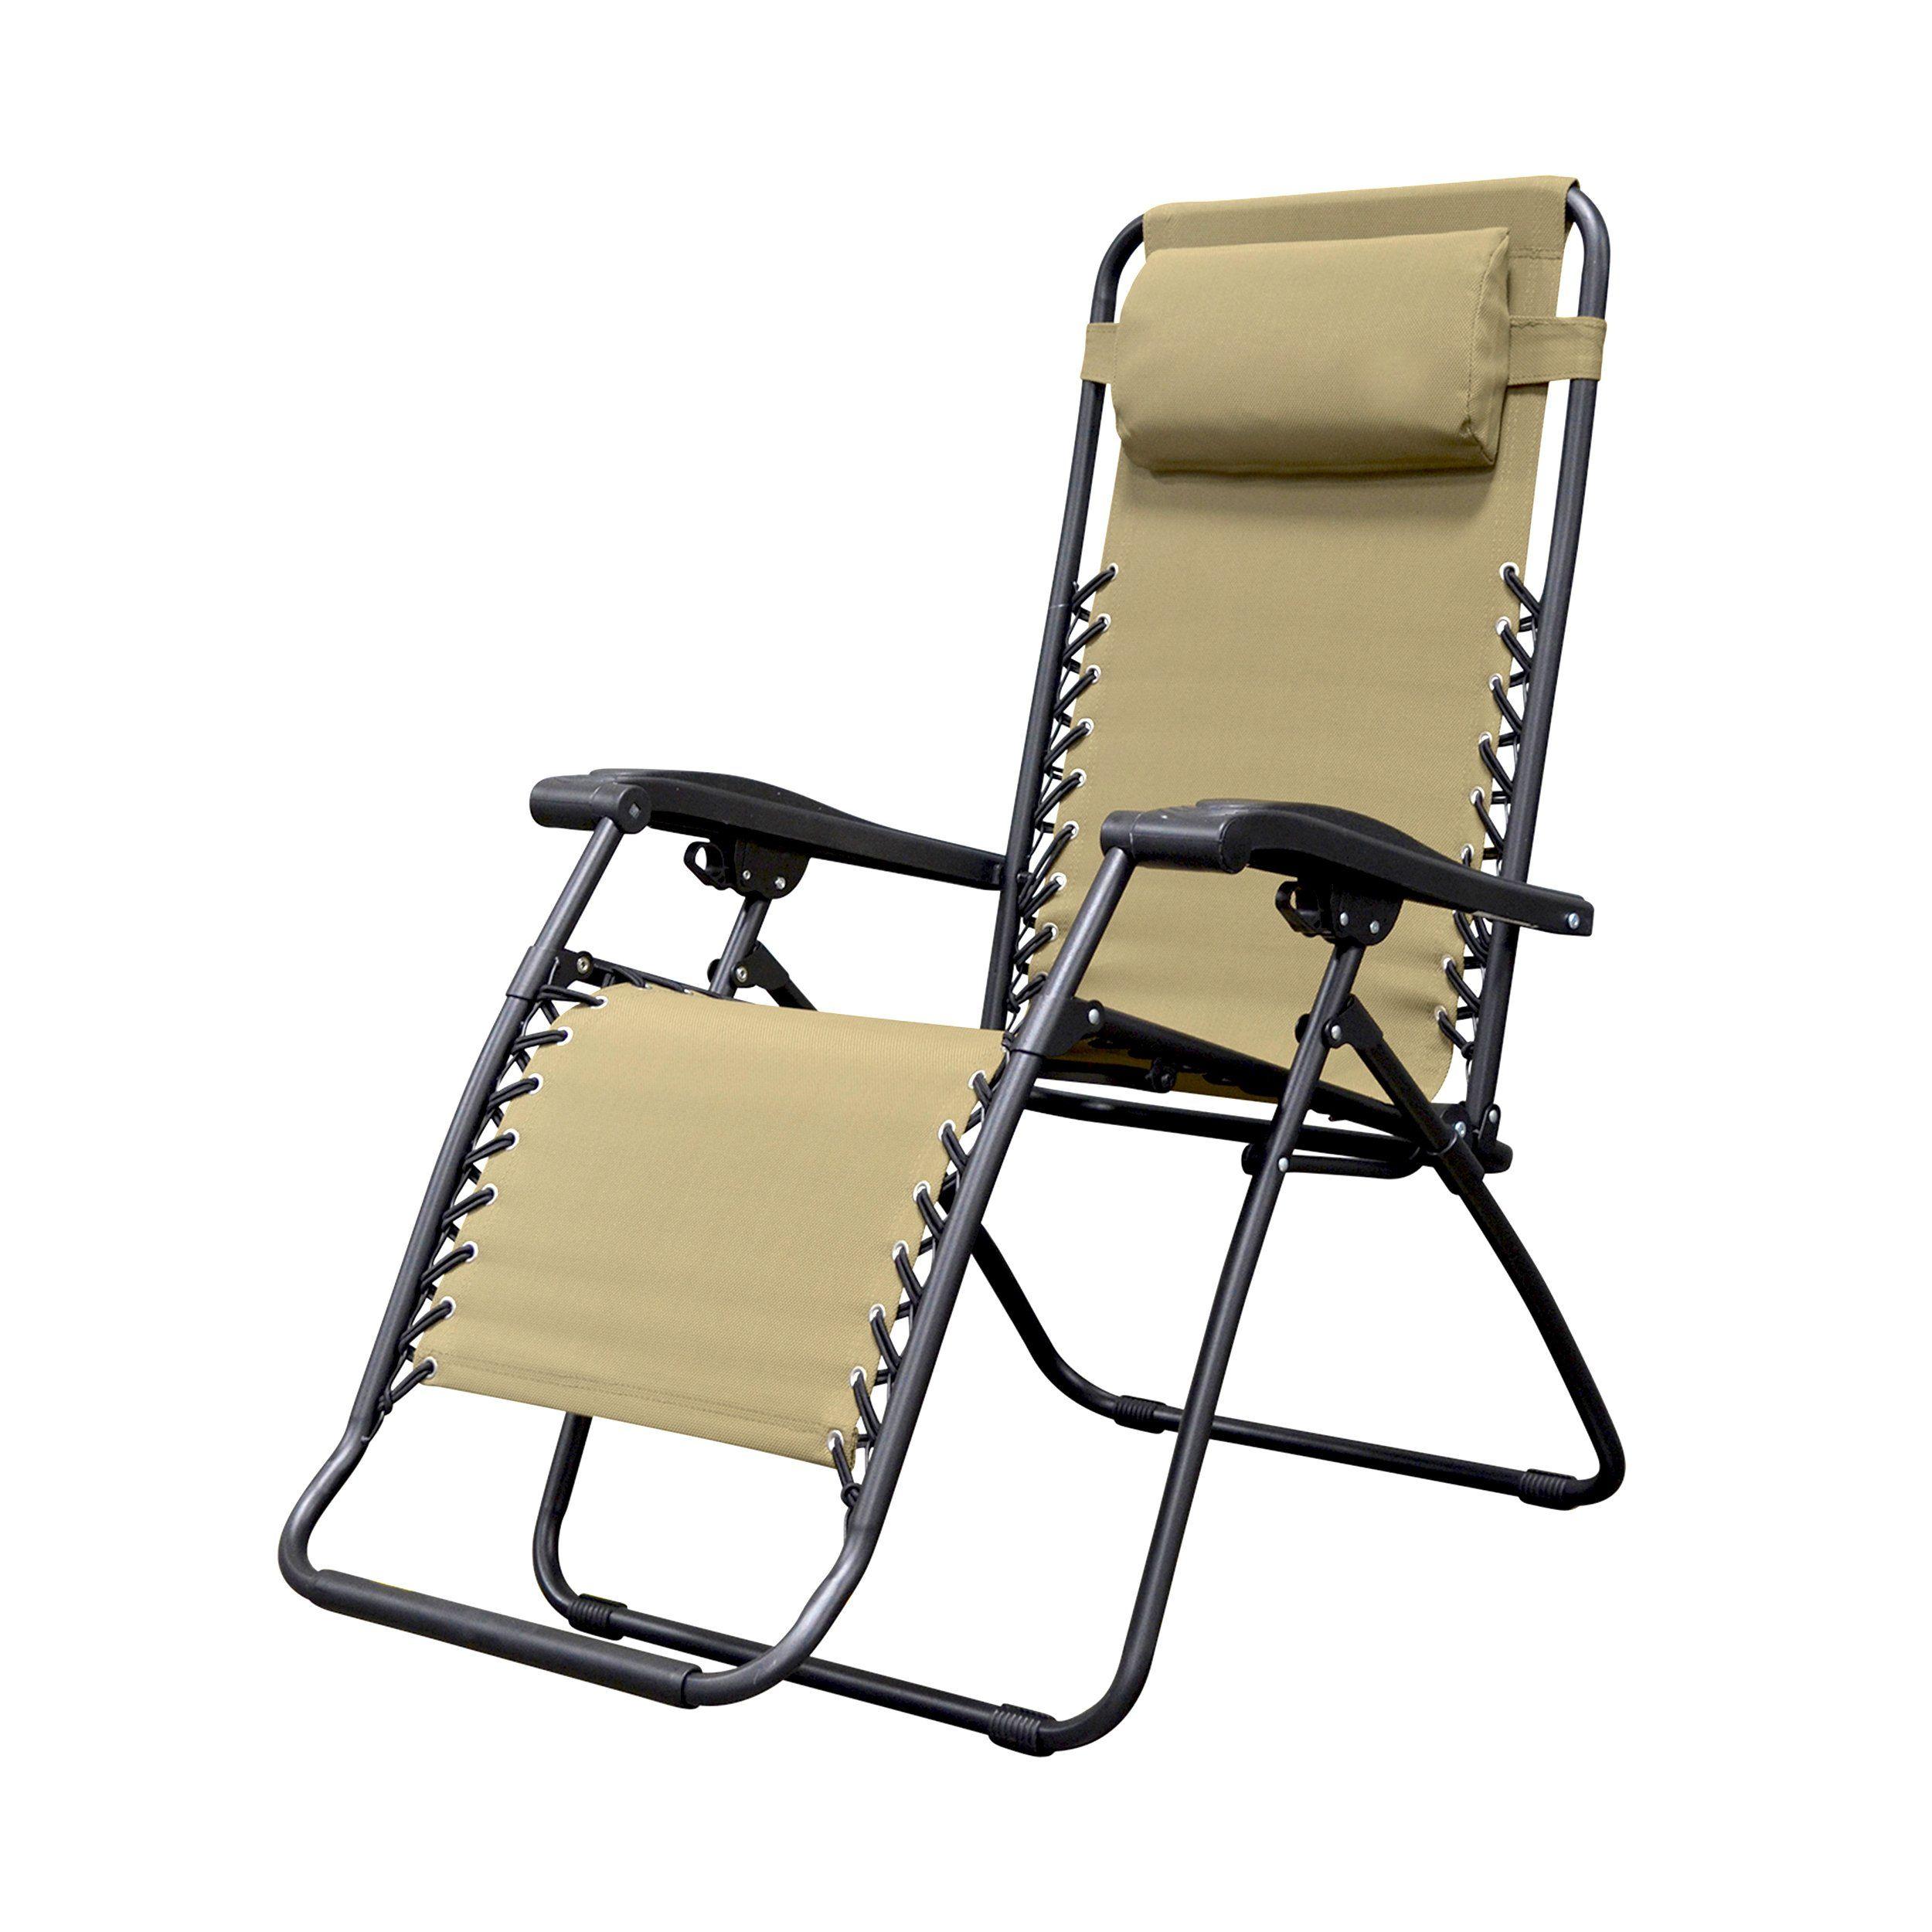 Caravan Sports Infinity Zero Gravity Chair Beige Read More At The